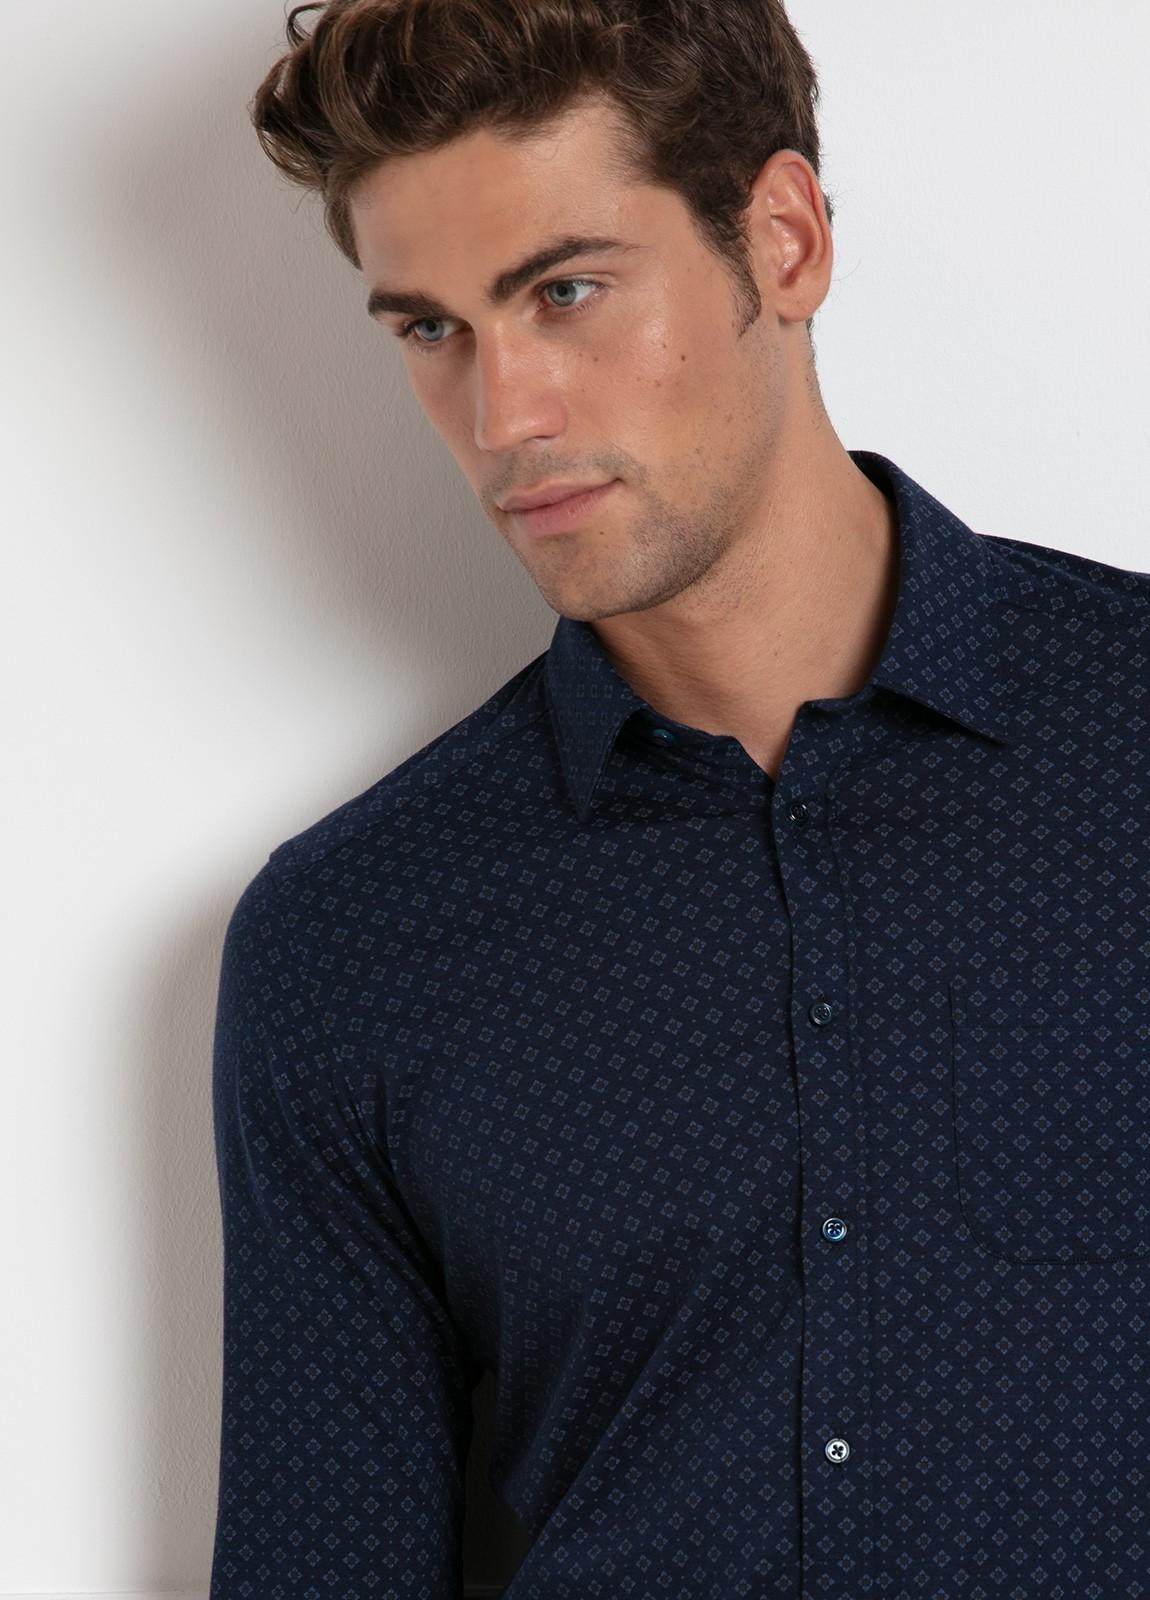 Camisa sport SLIM FIT modelo BLAKE estampado geométrico fondo azul marino, 100% Algodón.